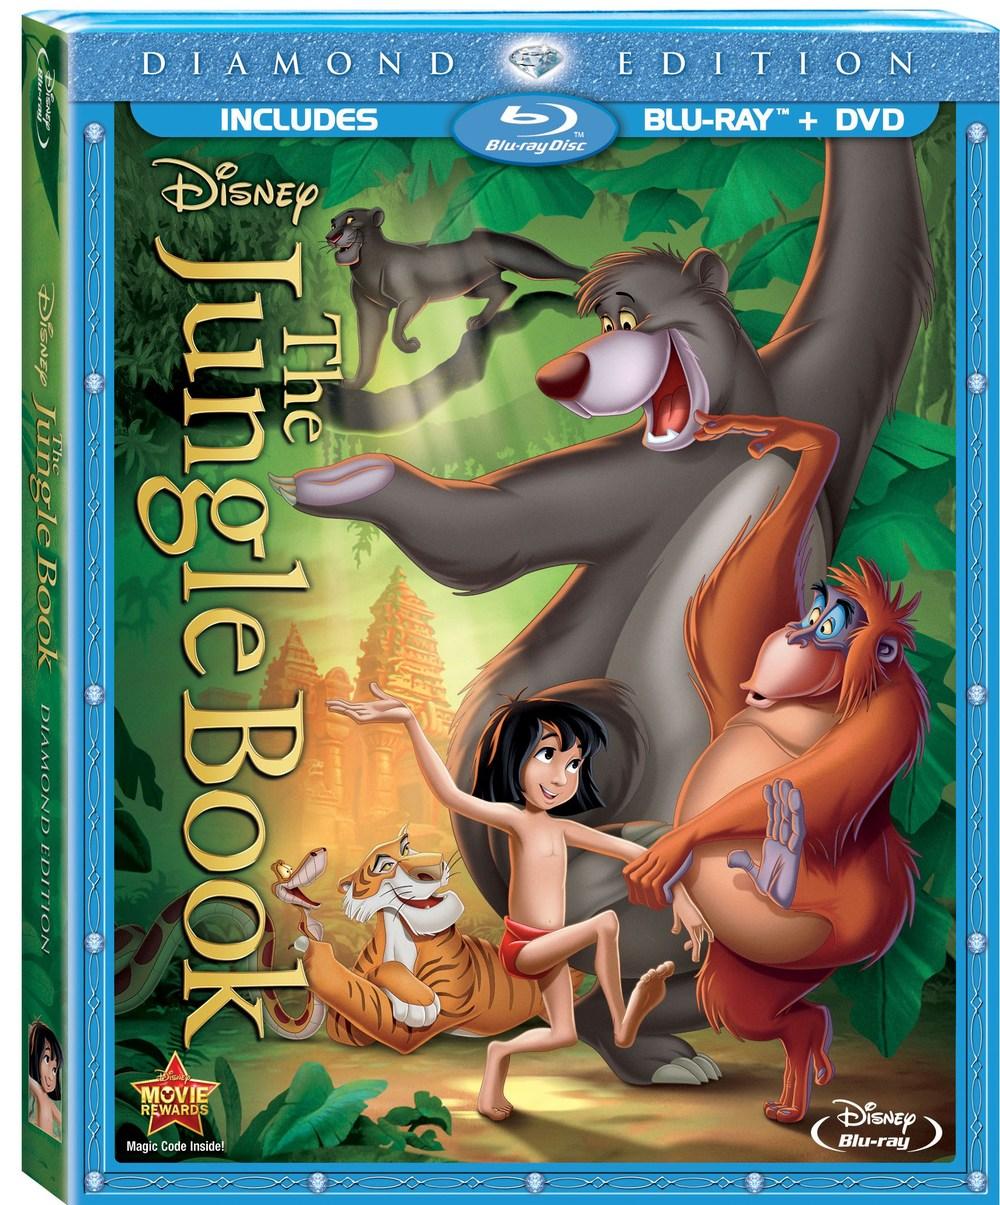 JungleBookDiamondBlurayCombo.jpg